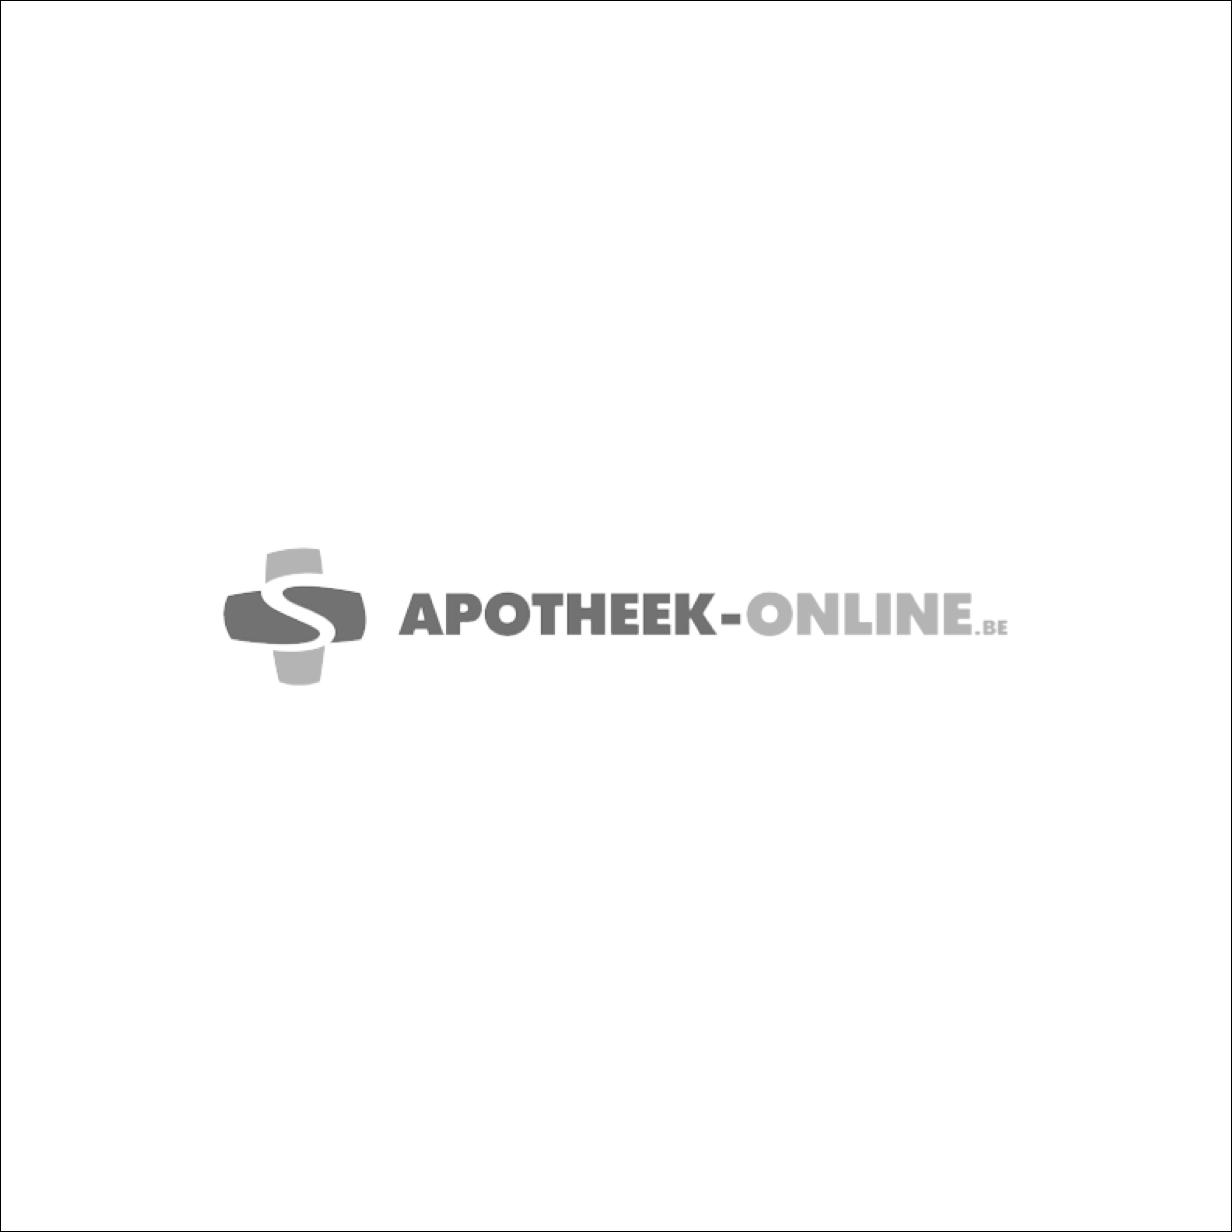 MOLLELAST HAFT WINDEL ELAST ADH 6CMX20M 30069